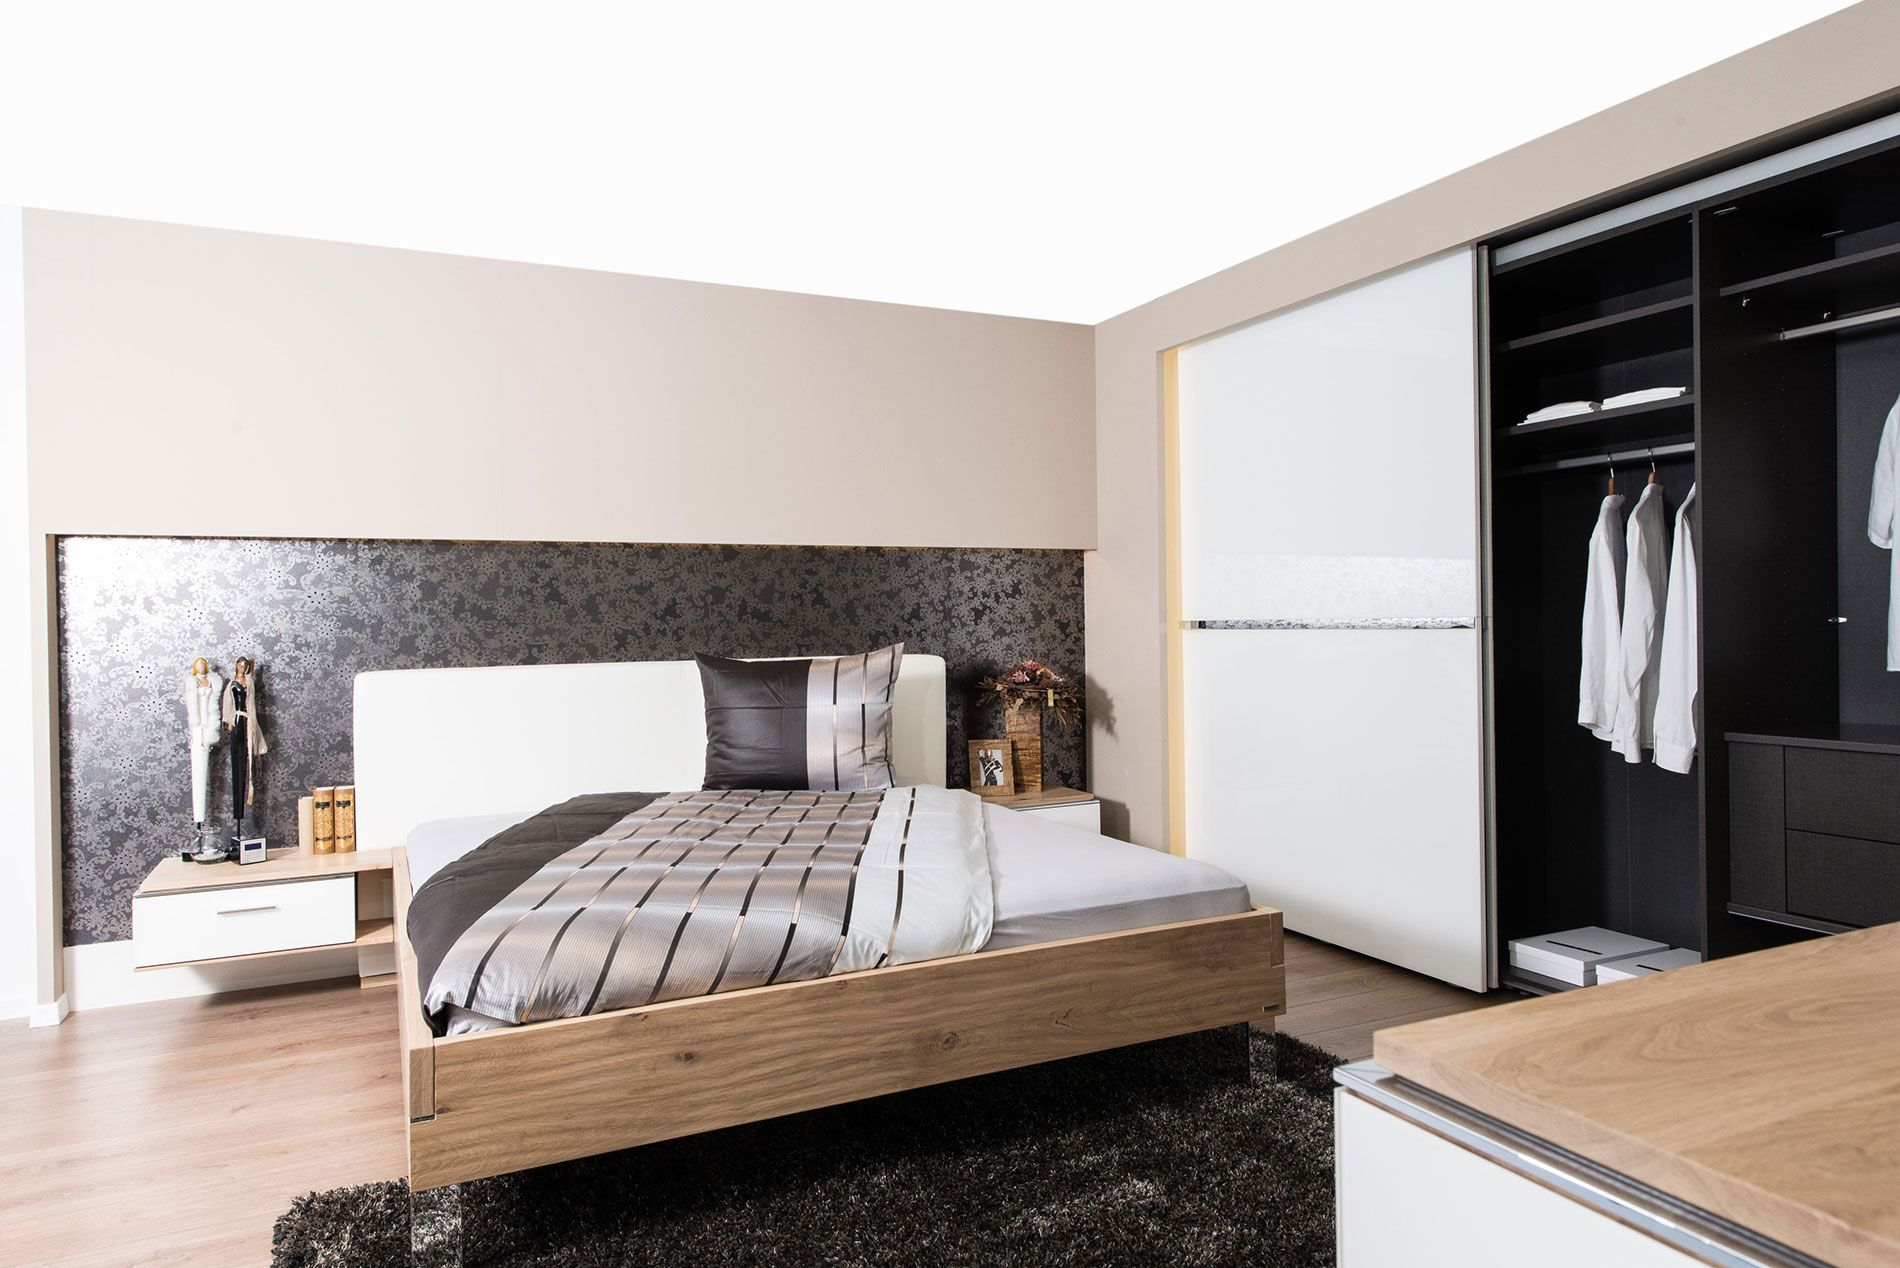 billige sitzscke latest great sitzscke with sitzscke kaufen with billige sitzscke great. Black Bedroom Furniture Sets. Home Design Ideas